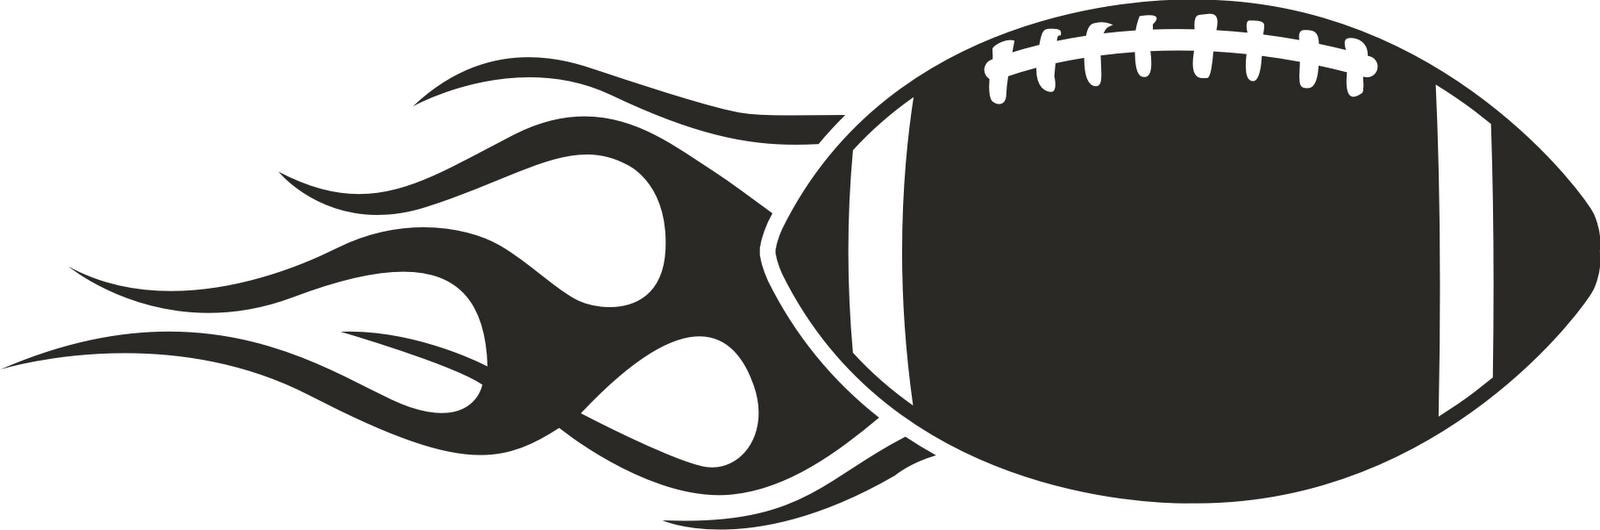 Football clipart american football 1600x530px Football Football American Free